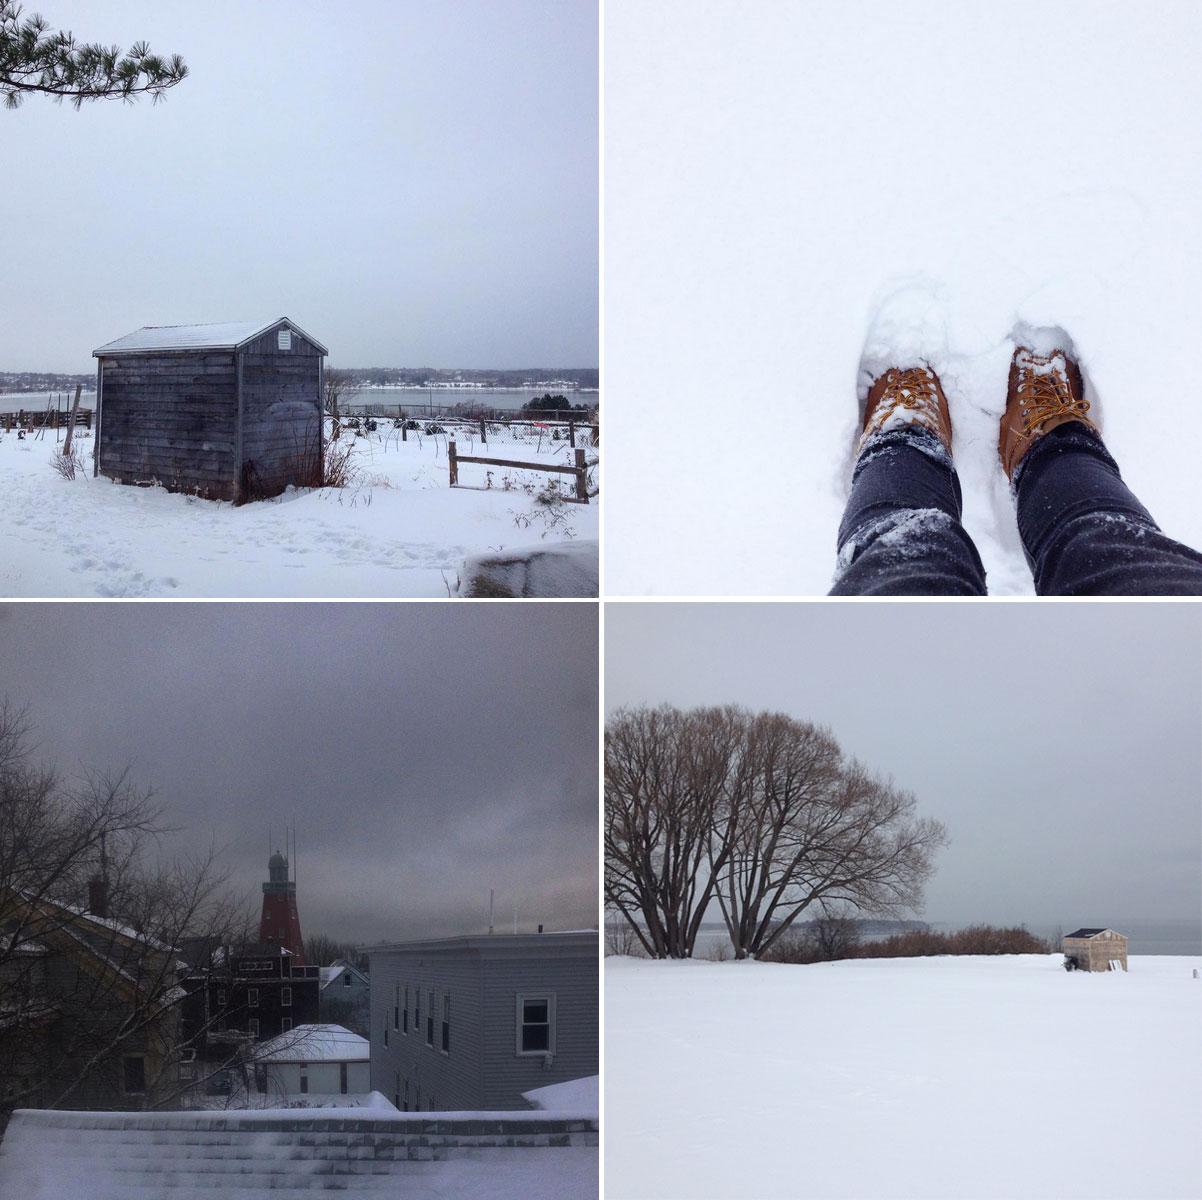 winterinmaine.jpg